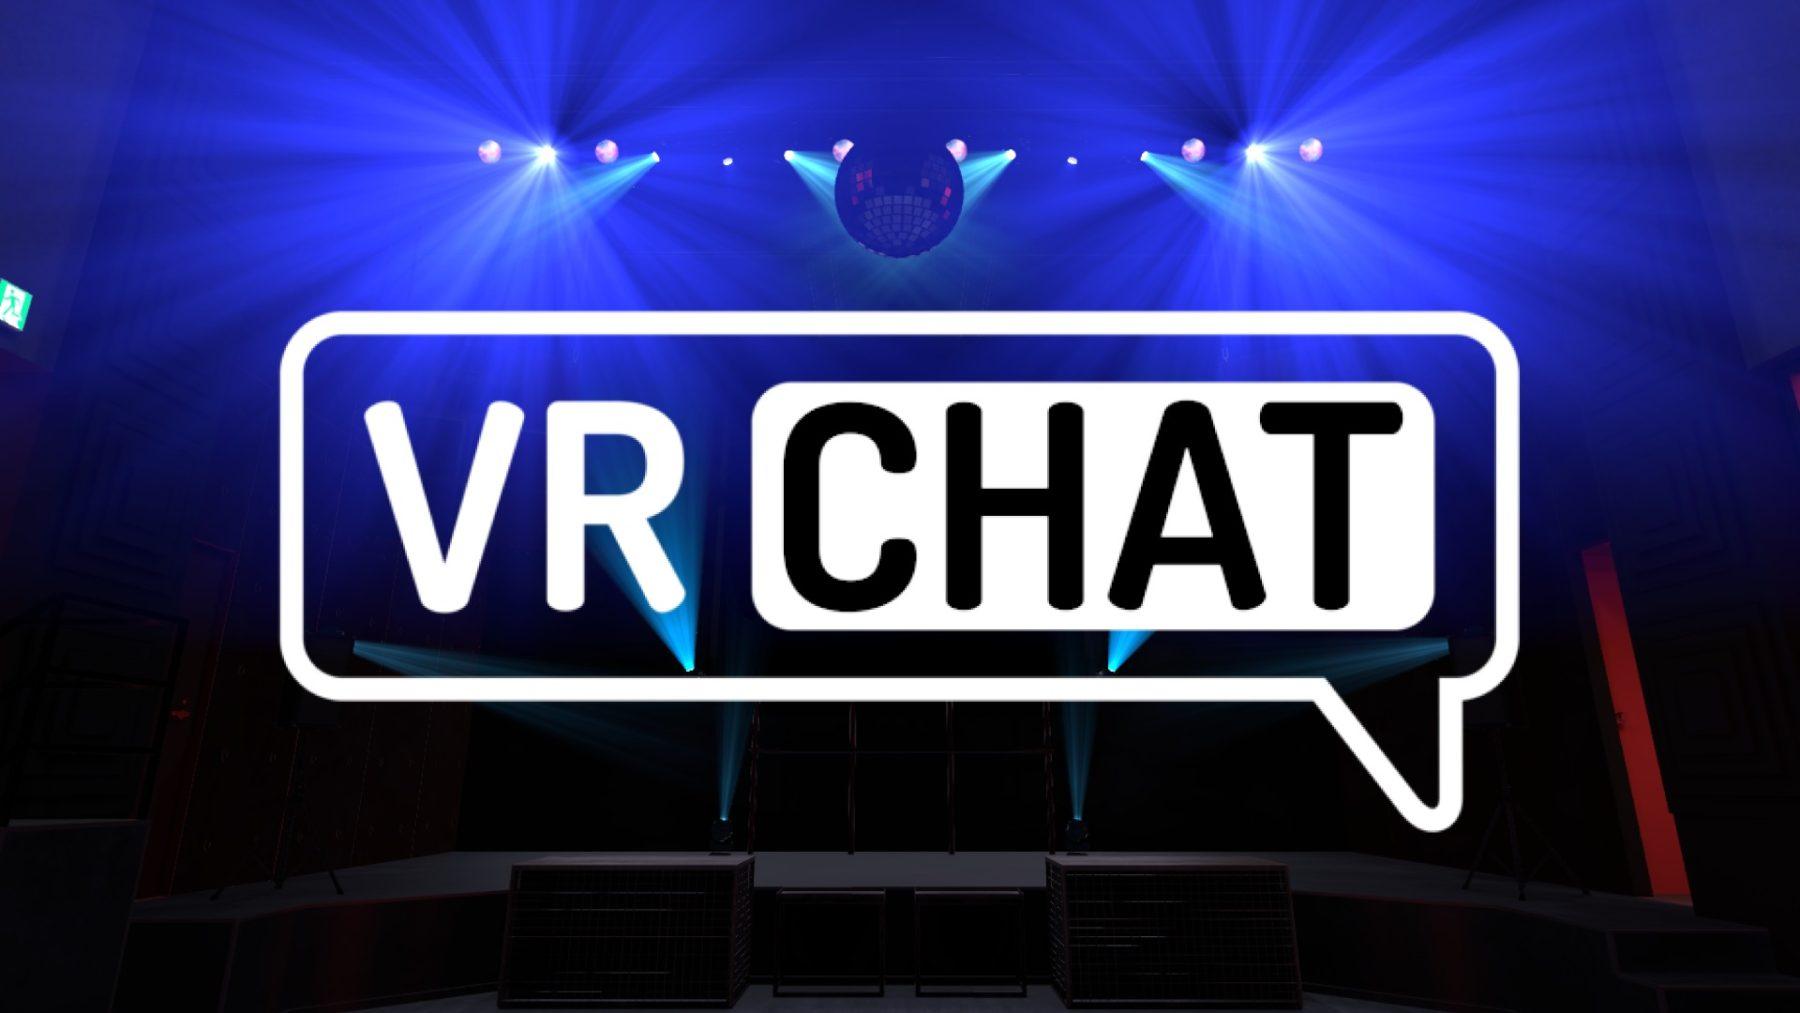 VRChatで「VIRTUAFREAK -REWIRE-@VR」が無料開放!